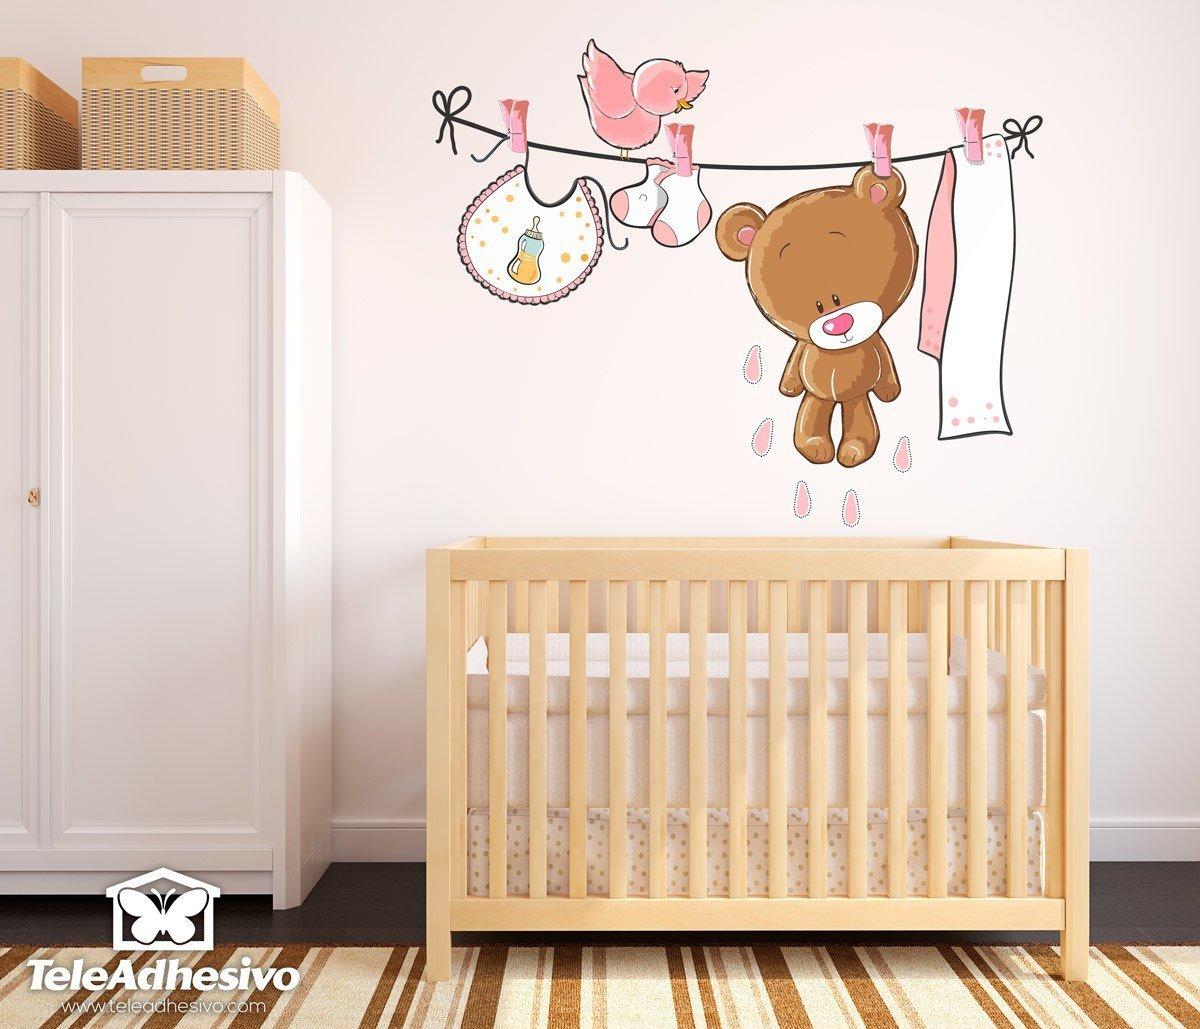 Adesivi per muro bambini fabulous camerette adesivi - Adesivi per muro cameretta ...